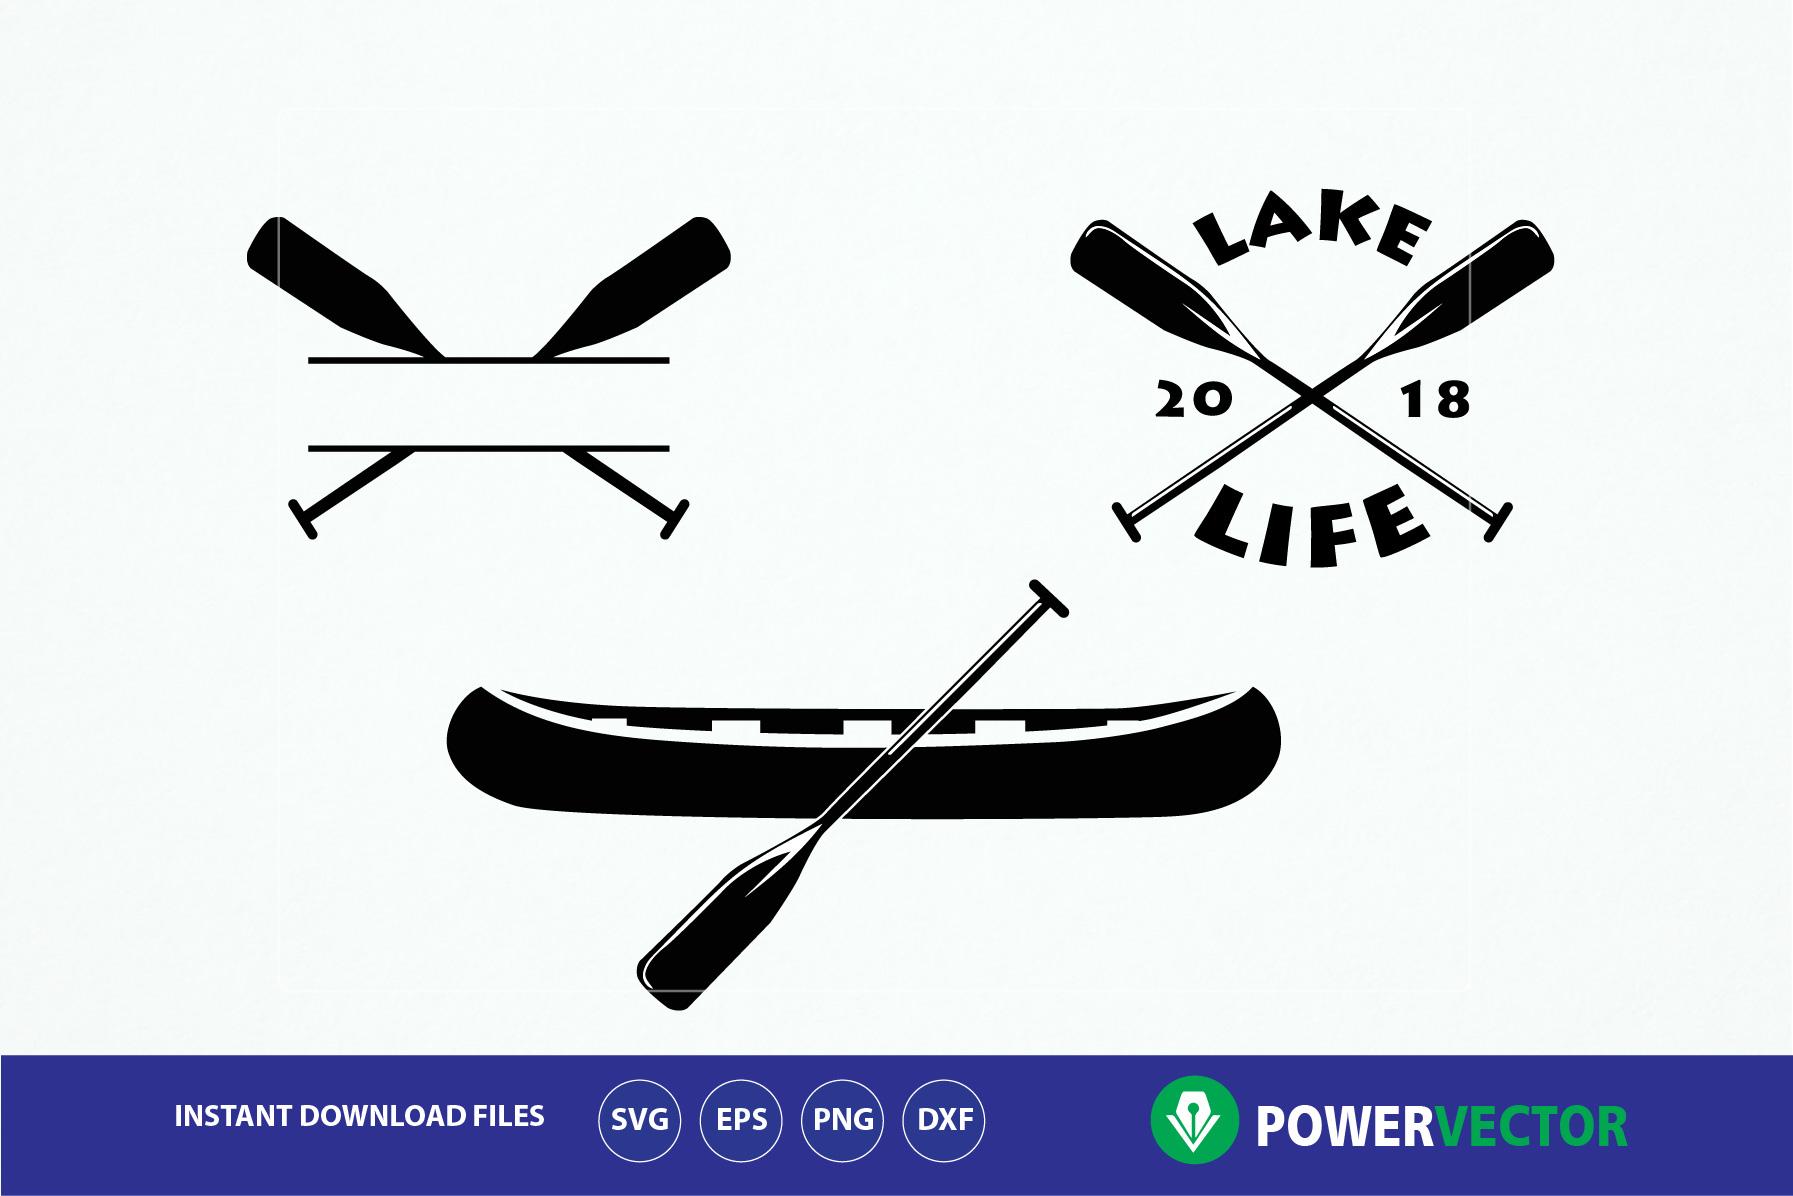 Lake Life SVG. Canoe Boat, Paddles Clip art.